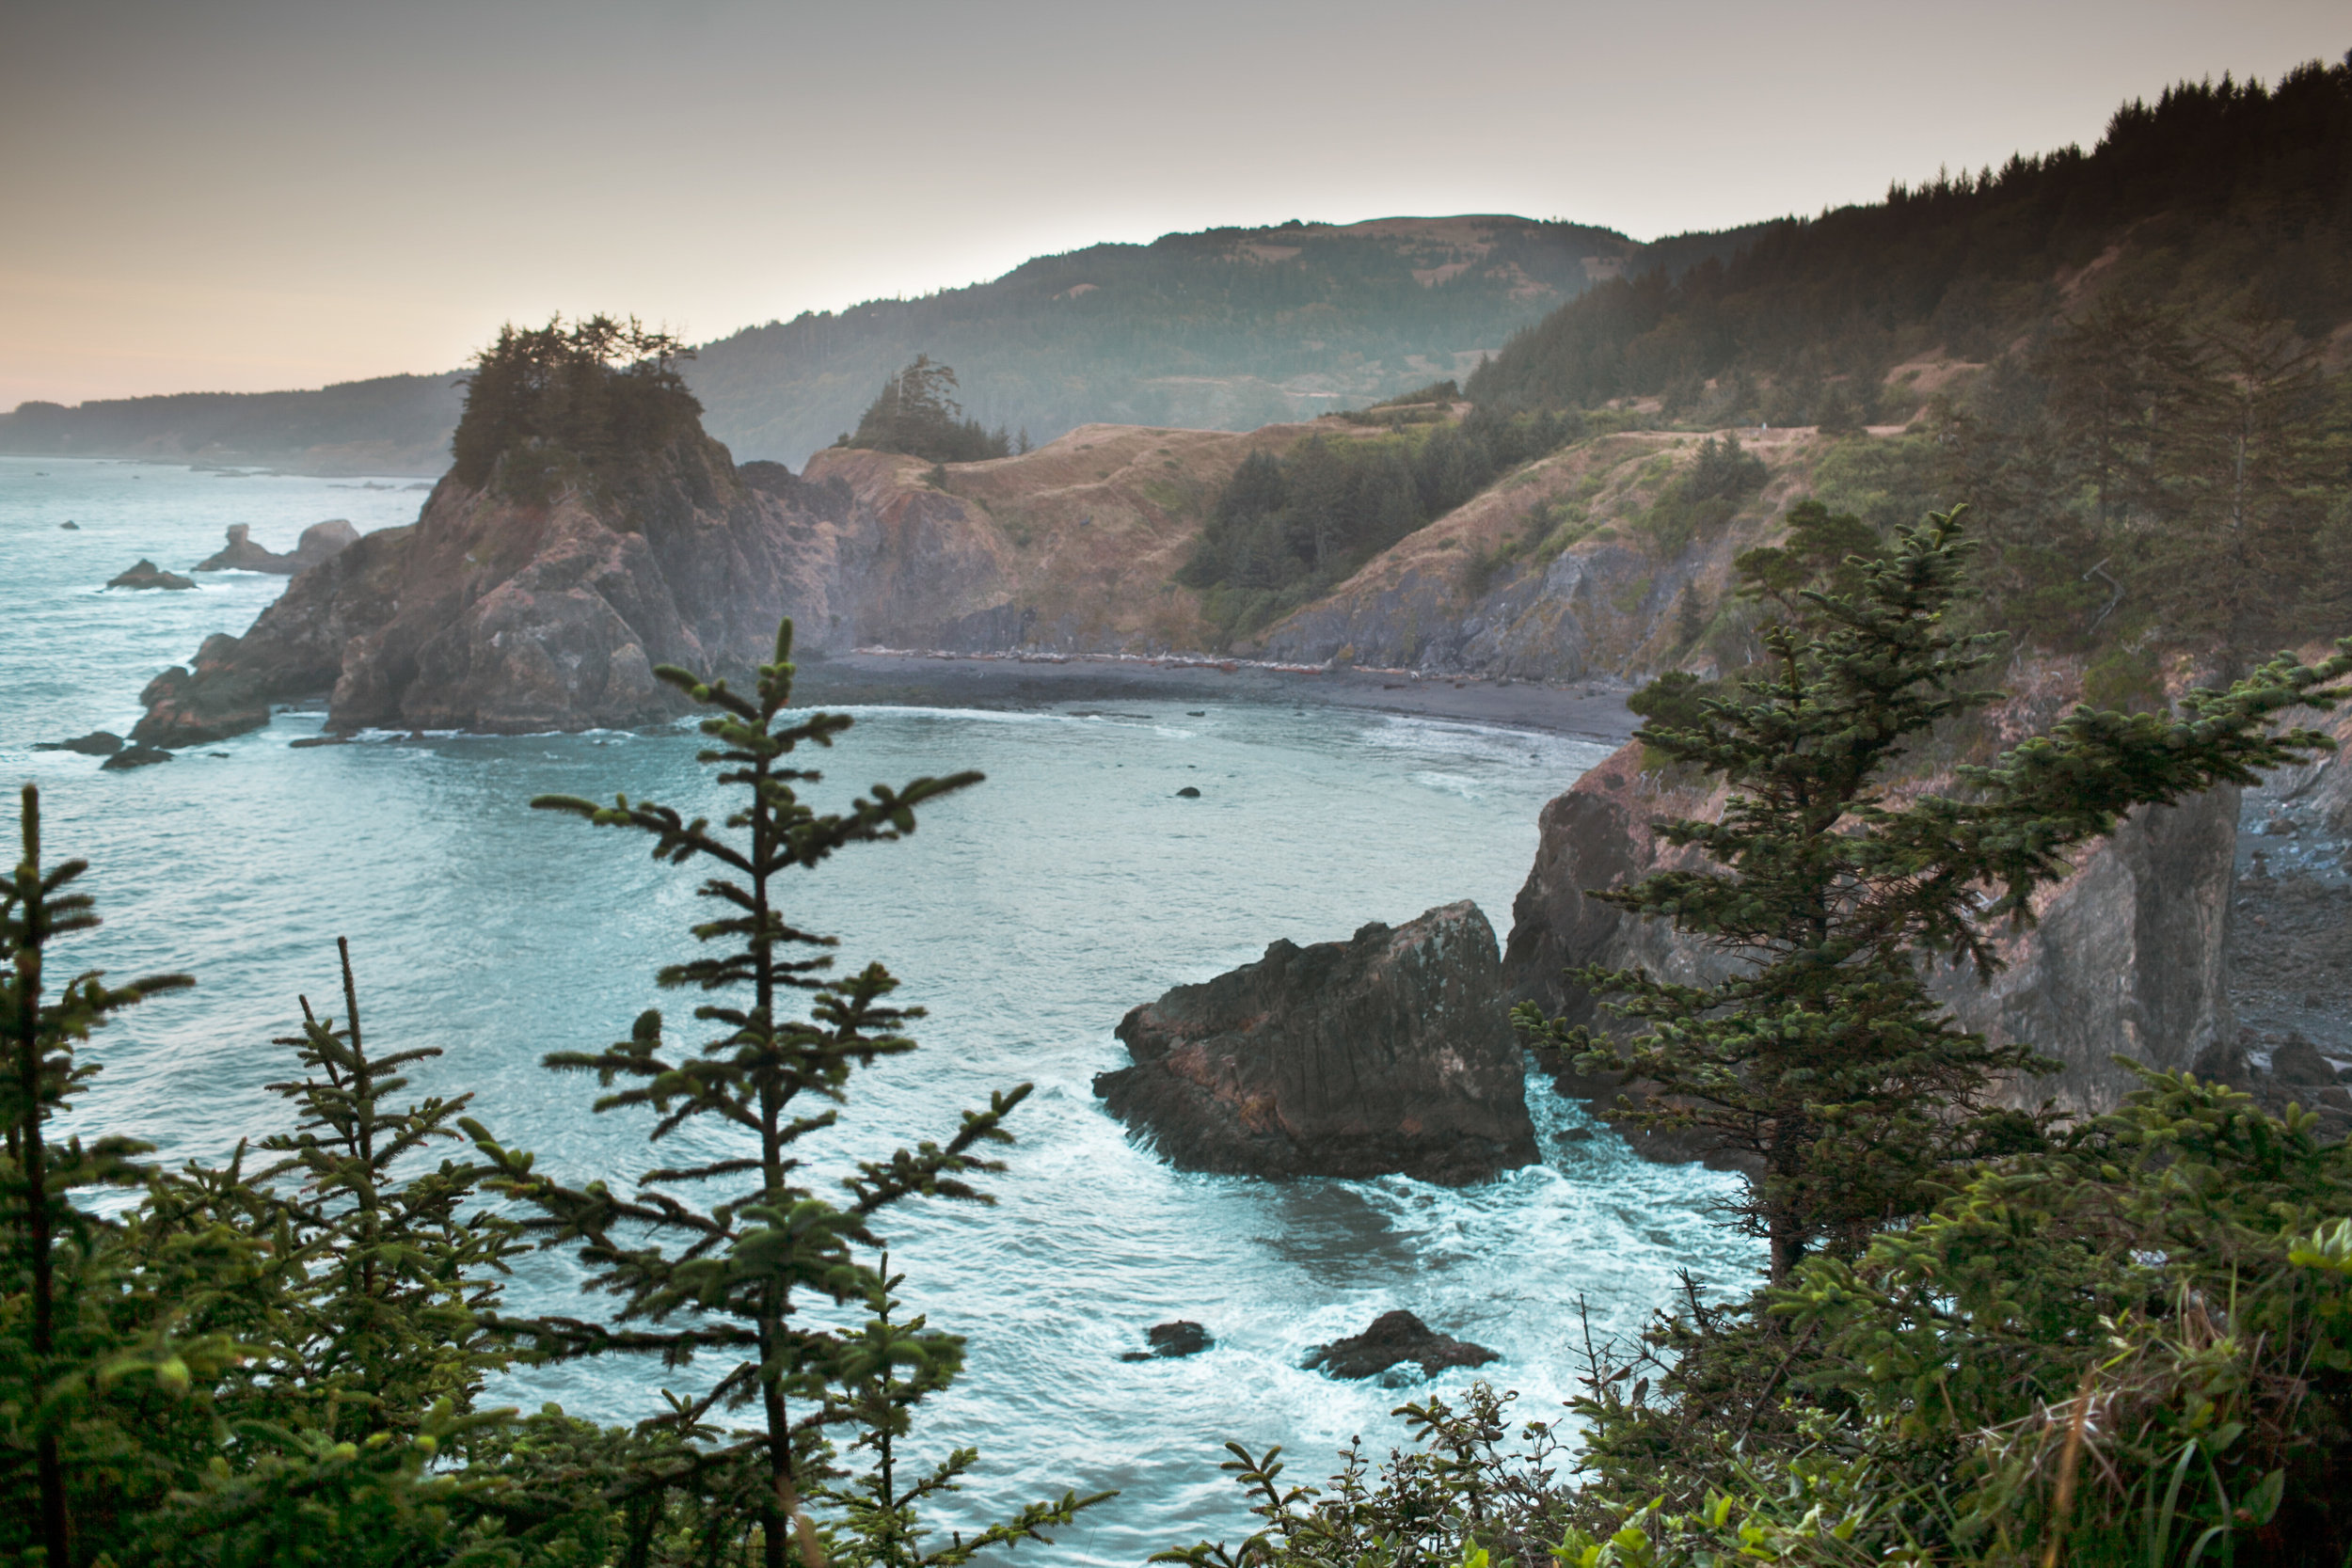 094Travel_Adventure_Outdoor_Photography_Outlive_Creative_Oregon_Coast_Samuel H Boardman State Park.jpg